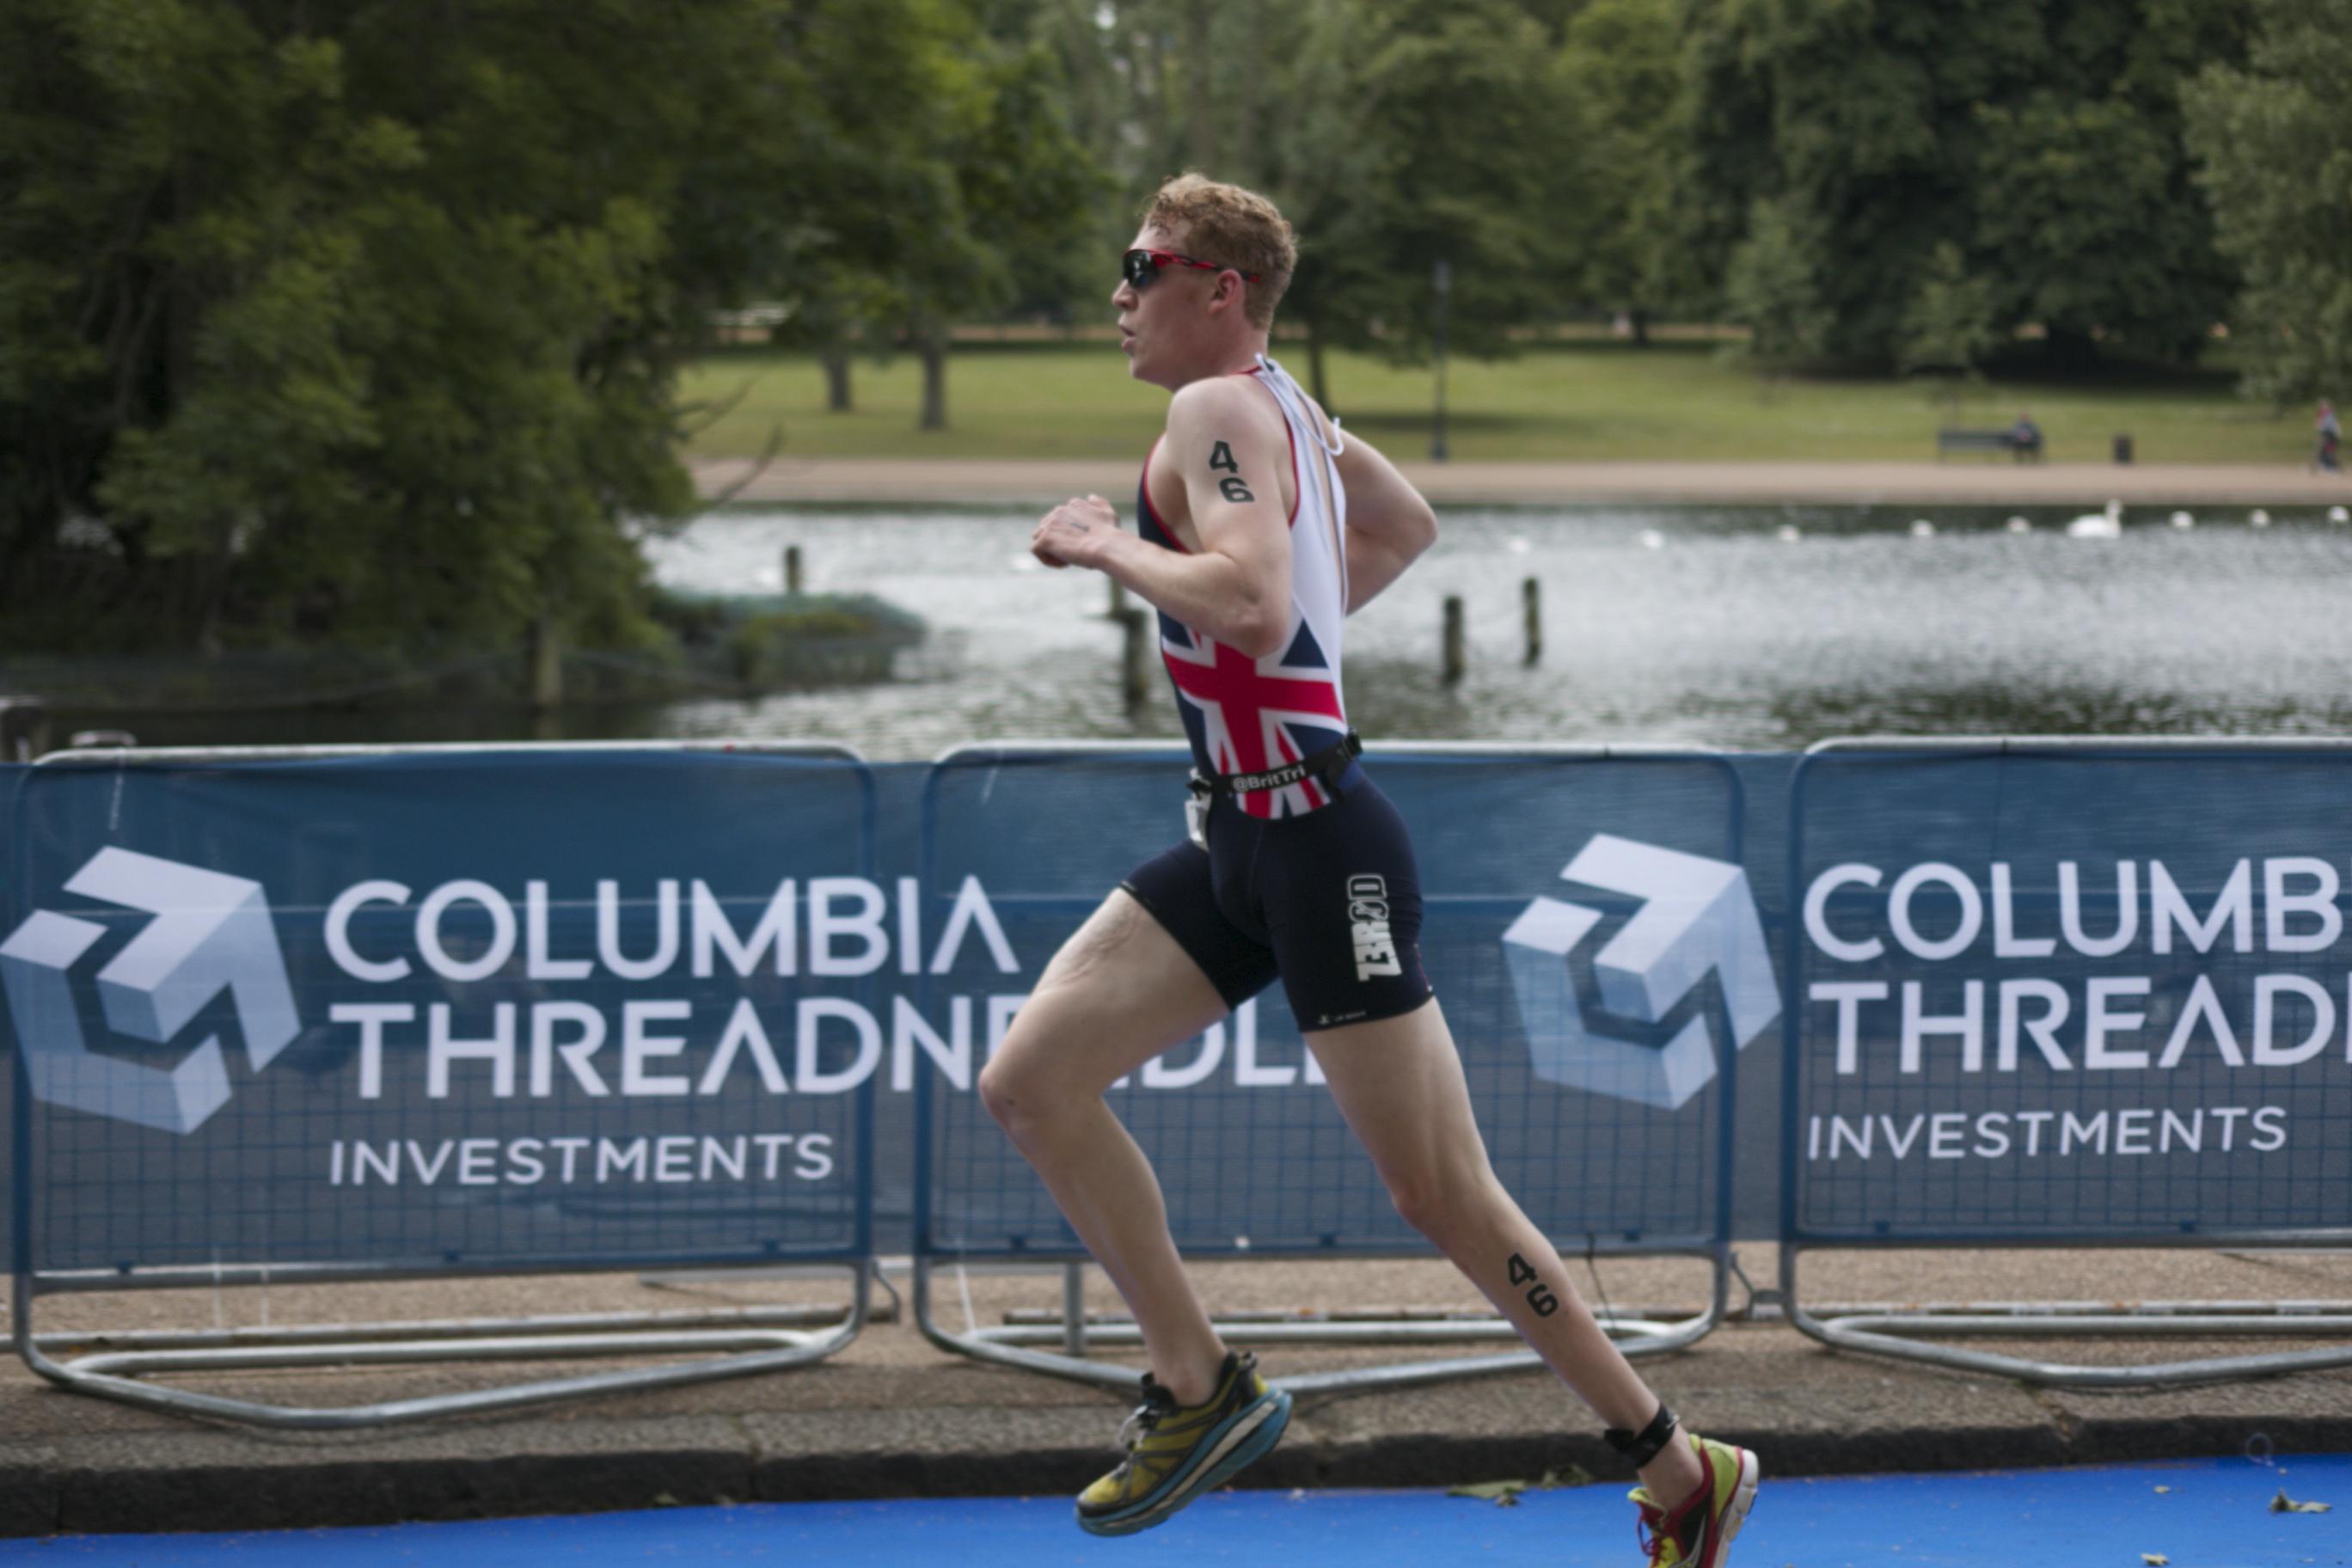 George Peasgood, 2015 British Triathlon Male Paratriathlete of the Year